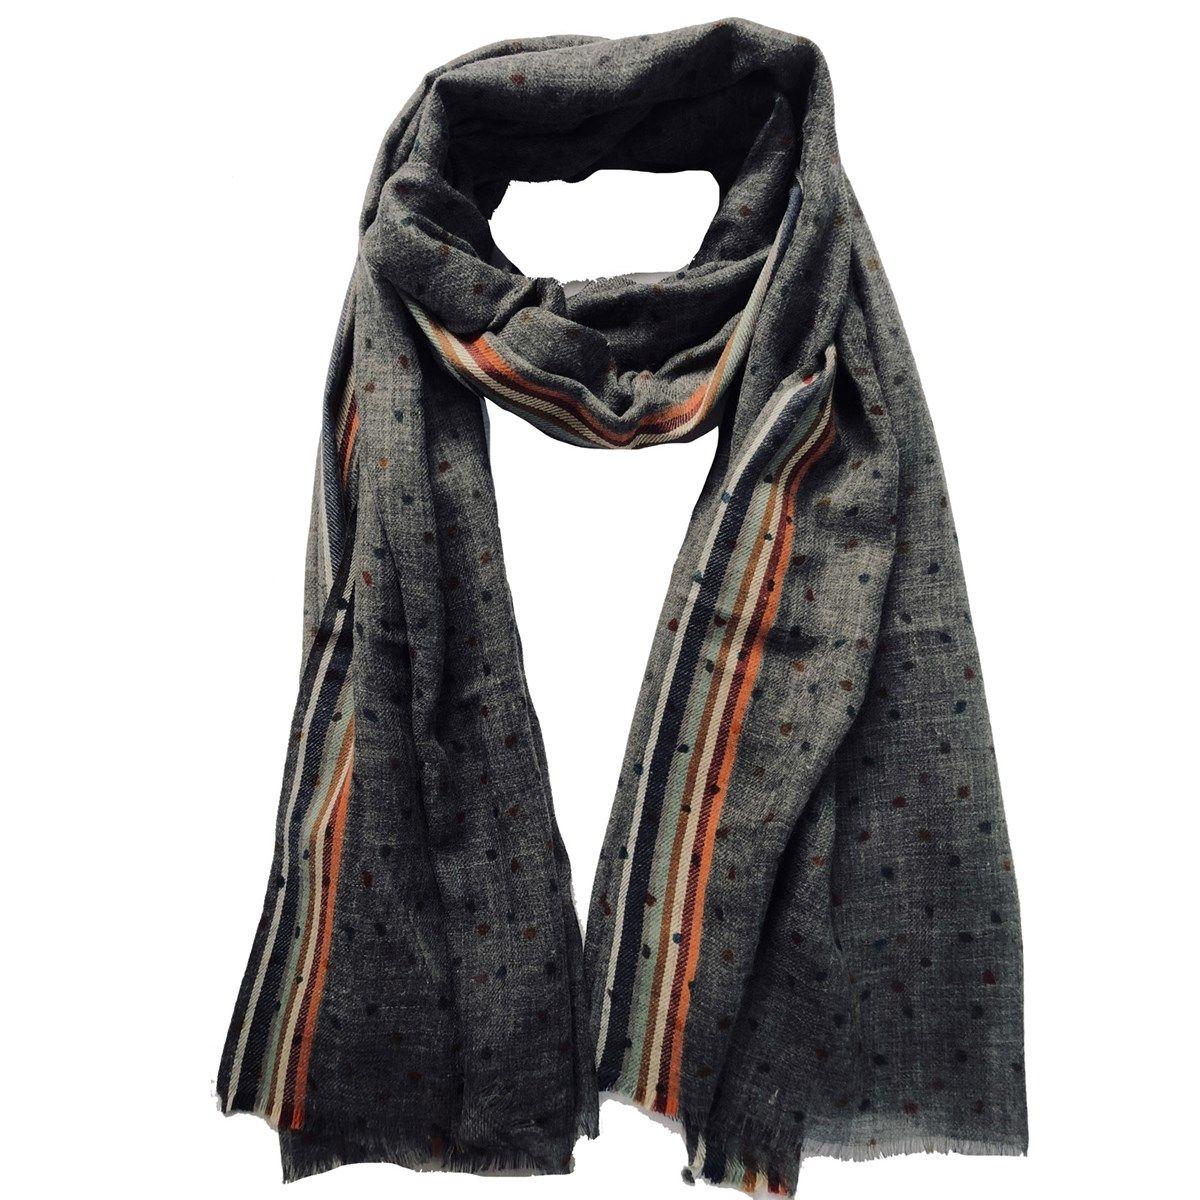 Écharpe douce laine pois polissons